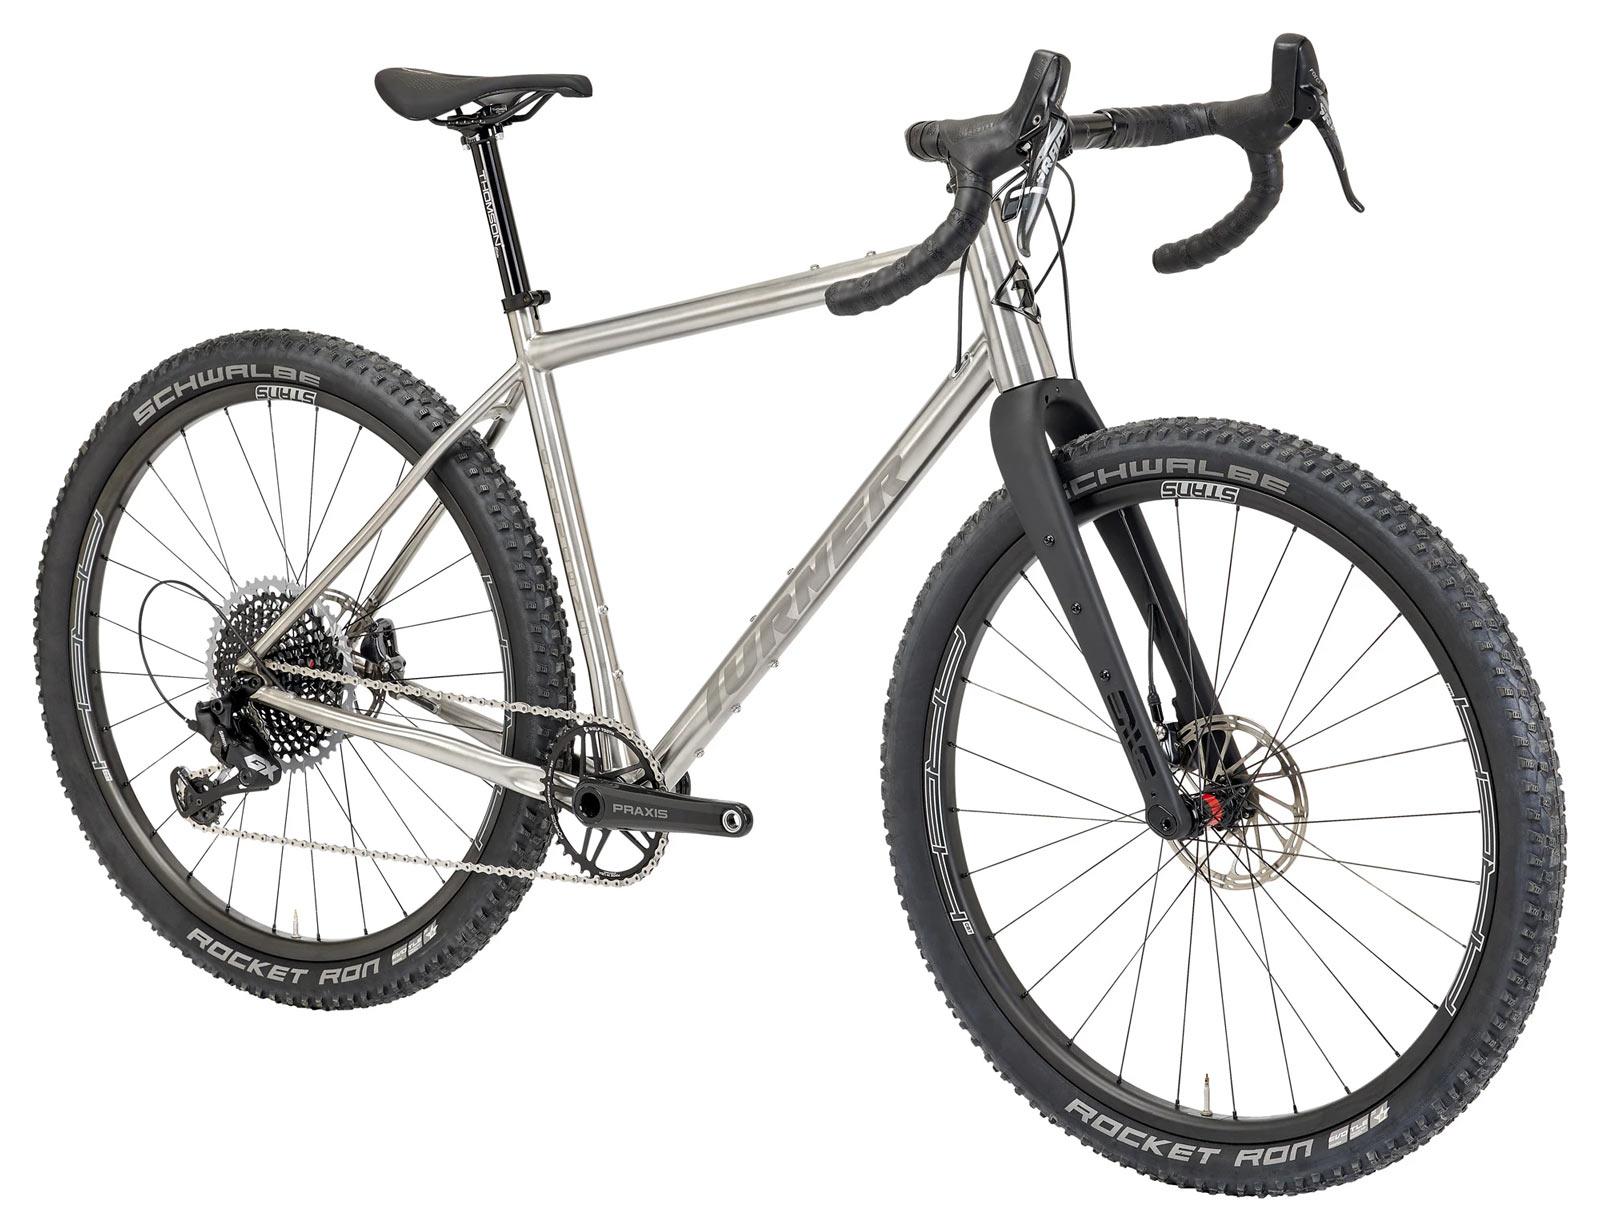 front angle view of 2022 turner cyclosys titanium gravel bike